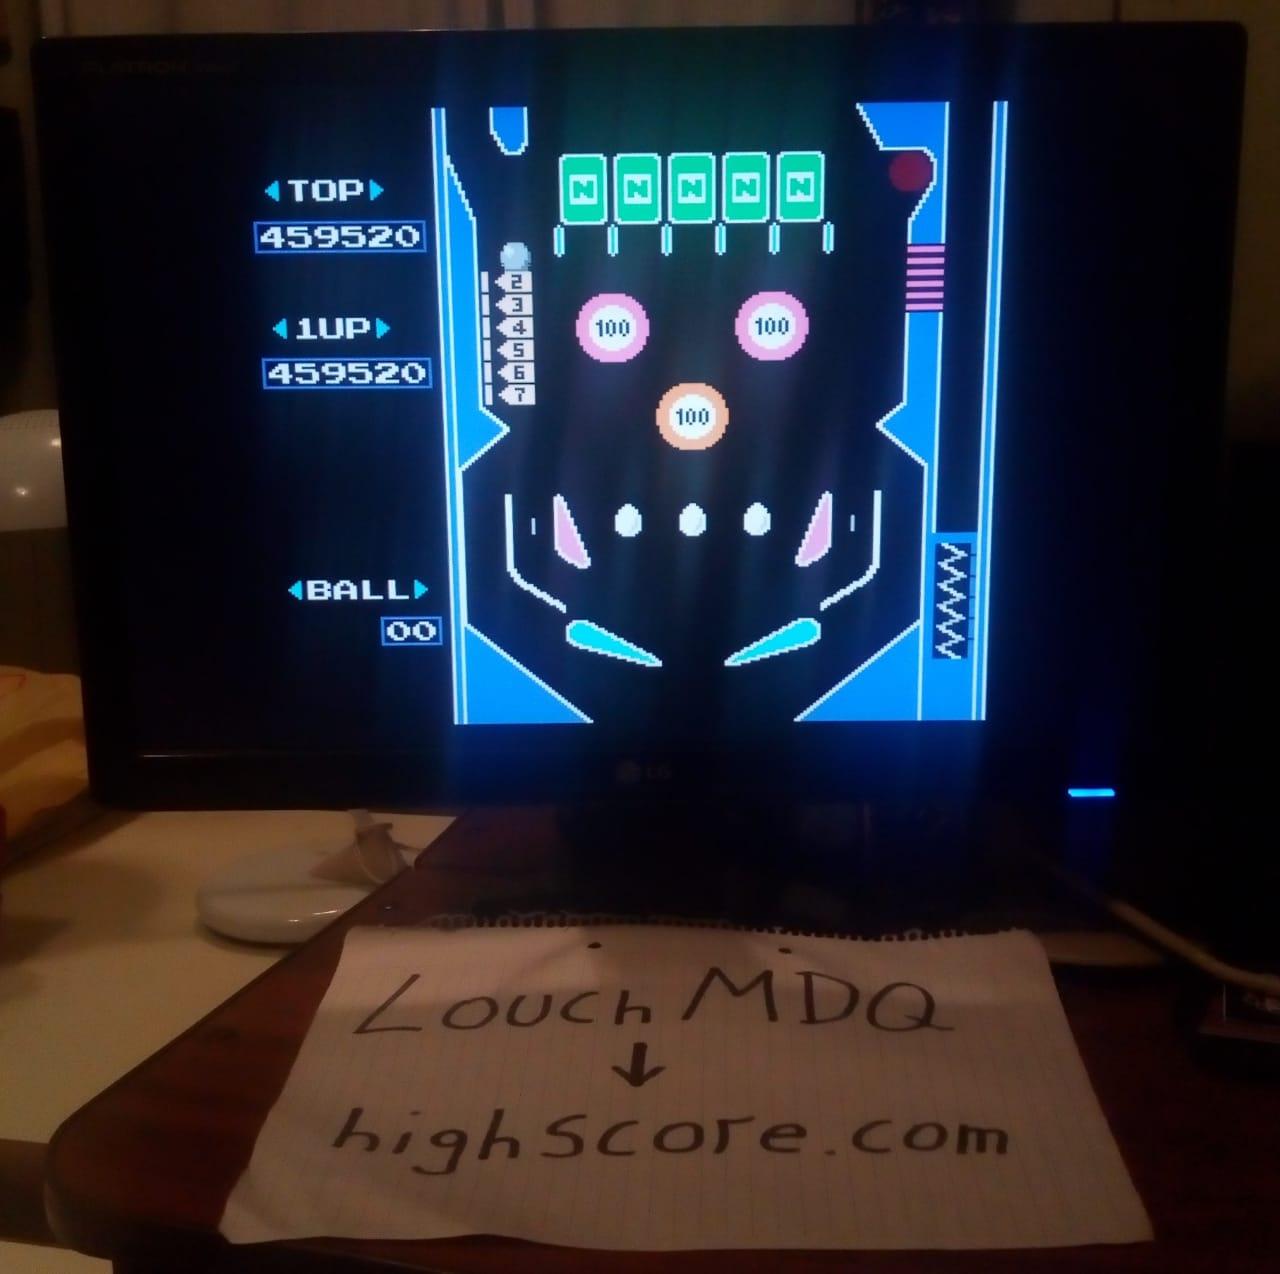 LouchMDQ: Pinball (NES/Famicom Emulated) 459,520 points on 2020-06-19 01:35:11